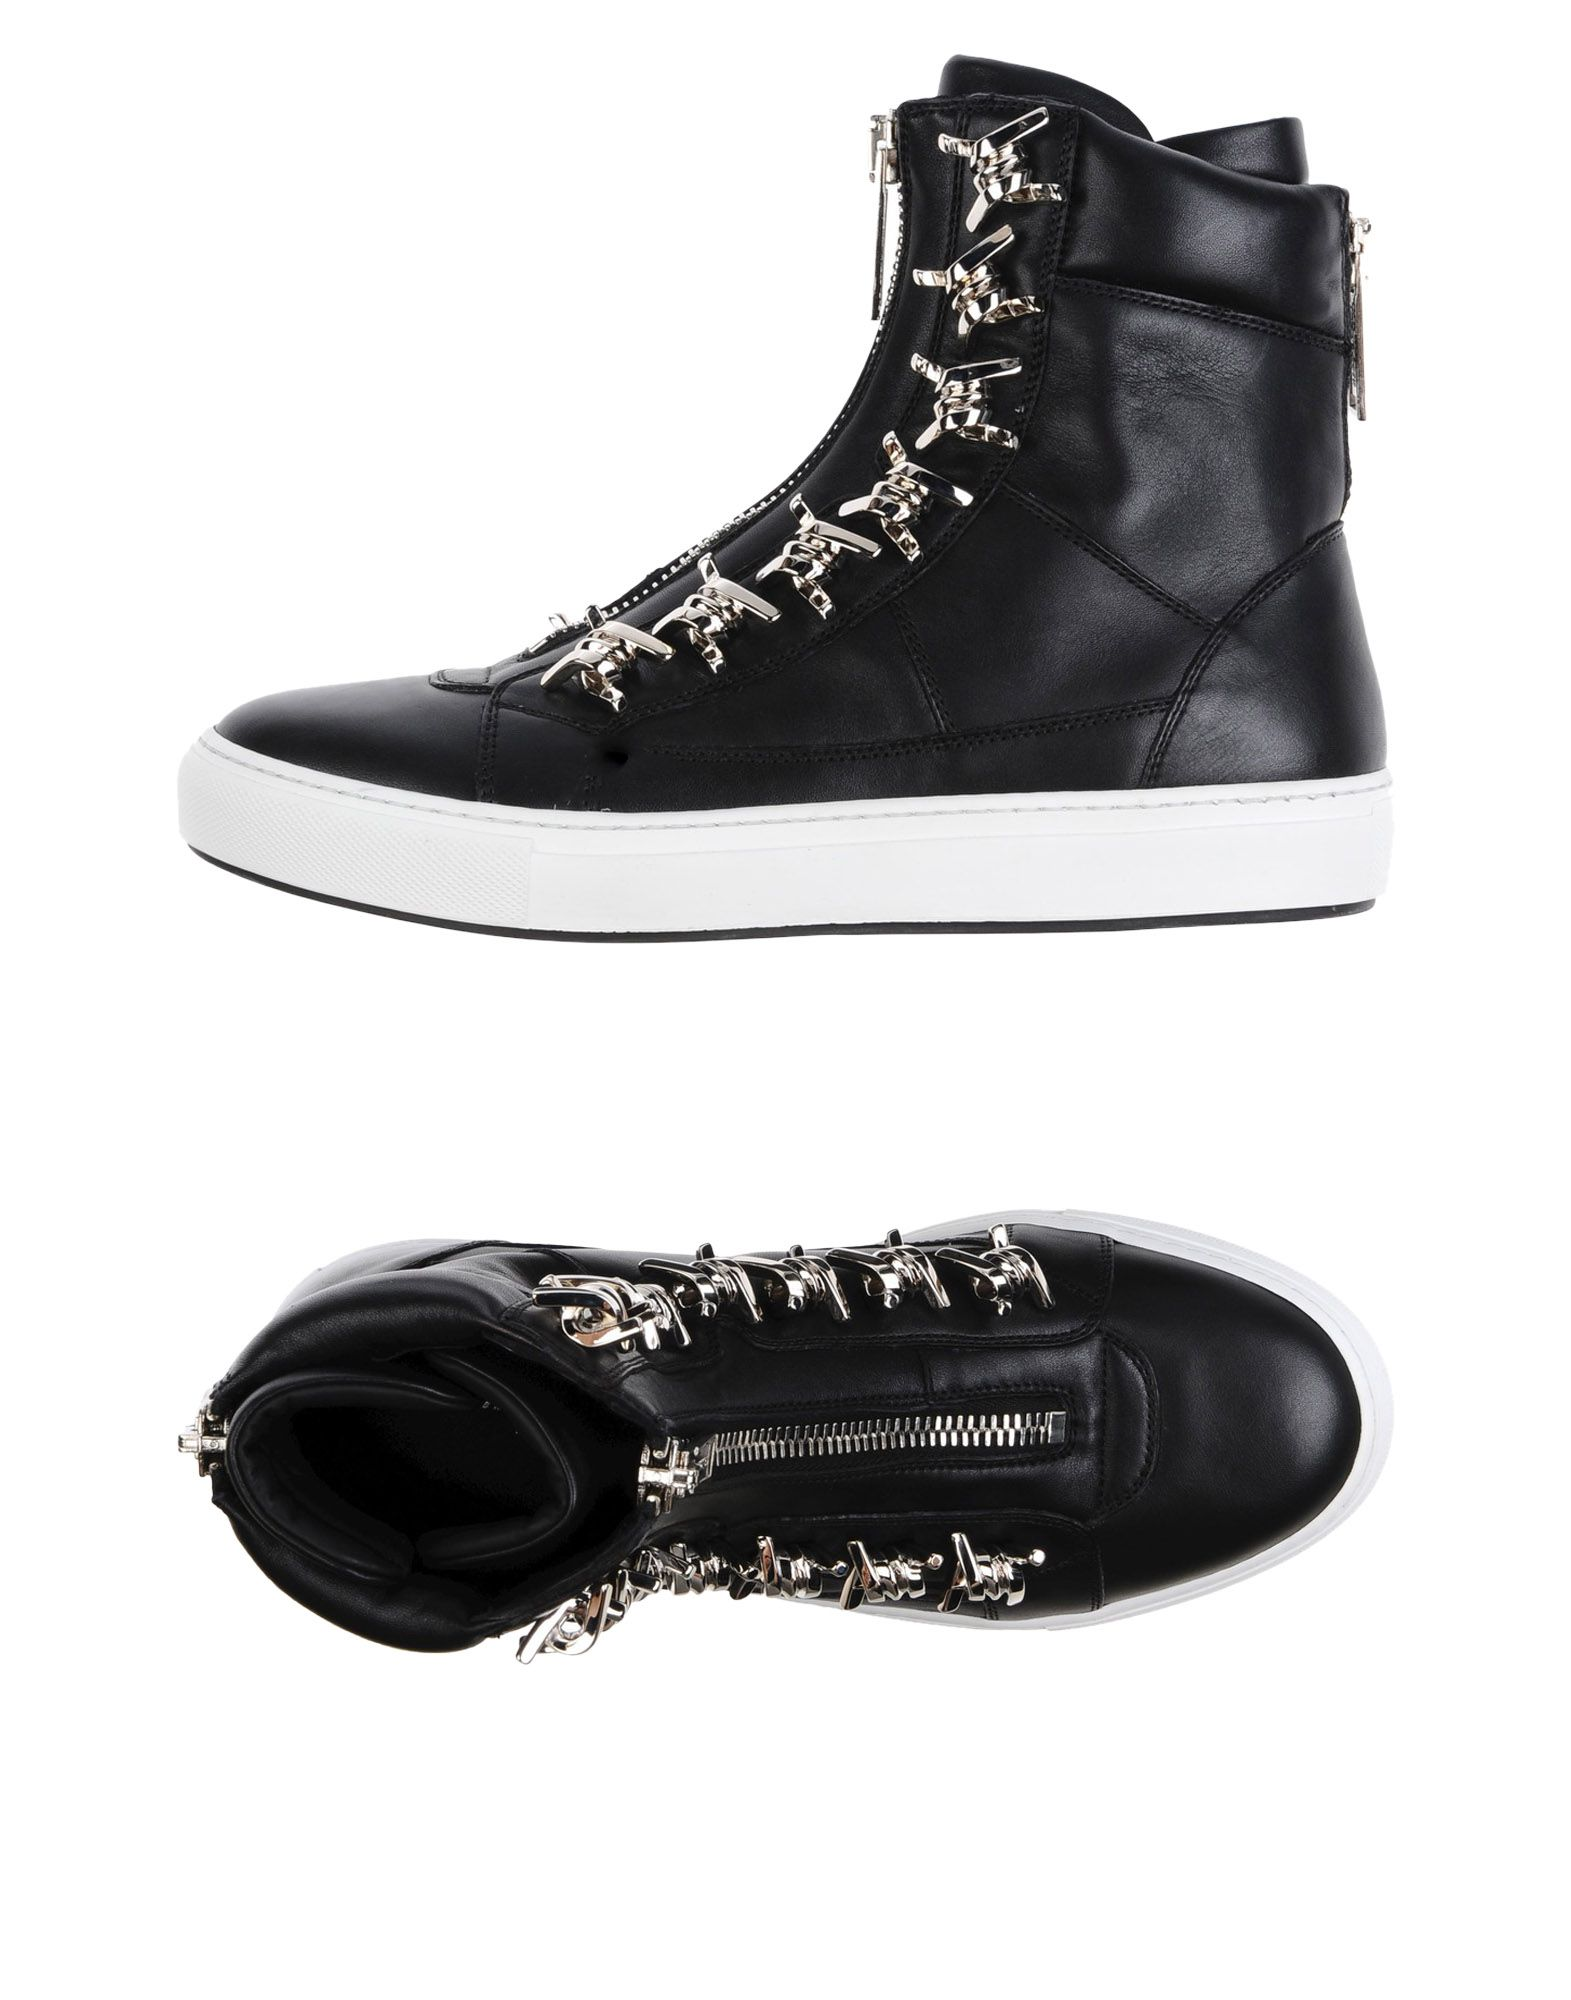 Dsquared2 Gute Sneakers Herren  11284150RR Gute Dsquared2 Qualität beliebte Schuhe d12ab0